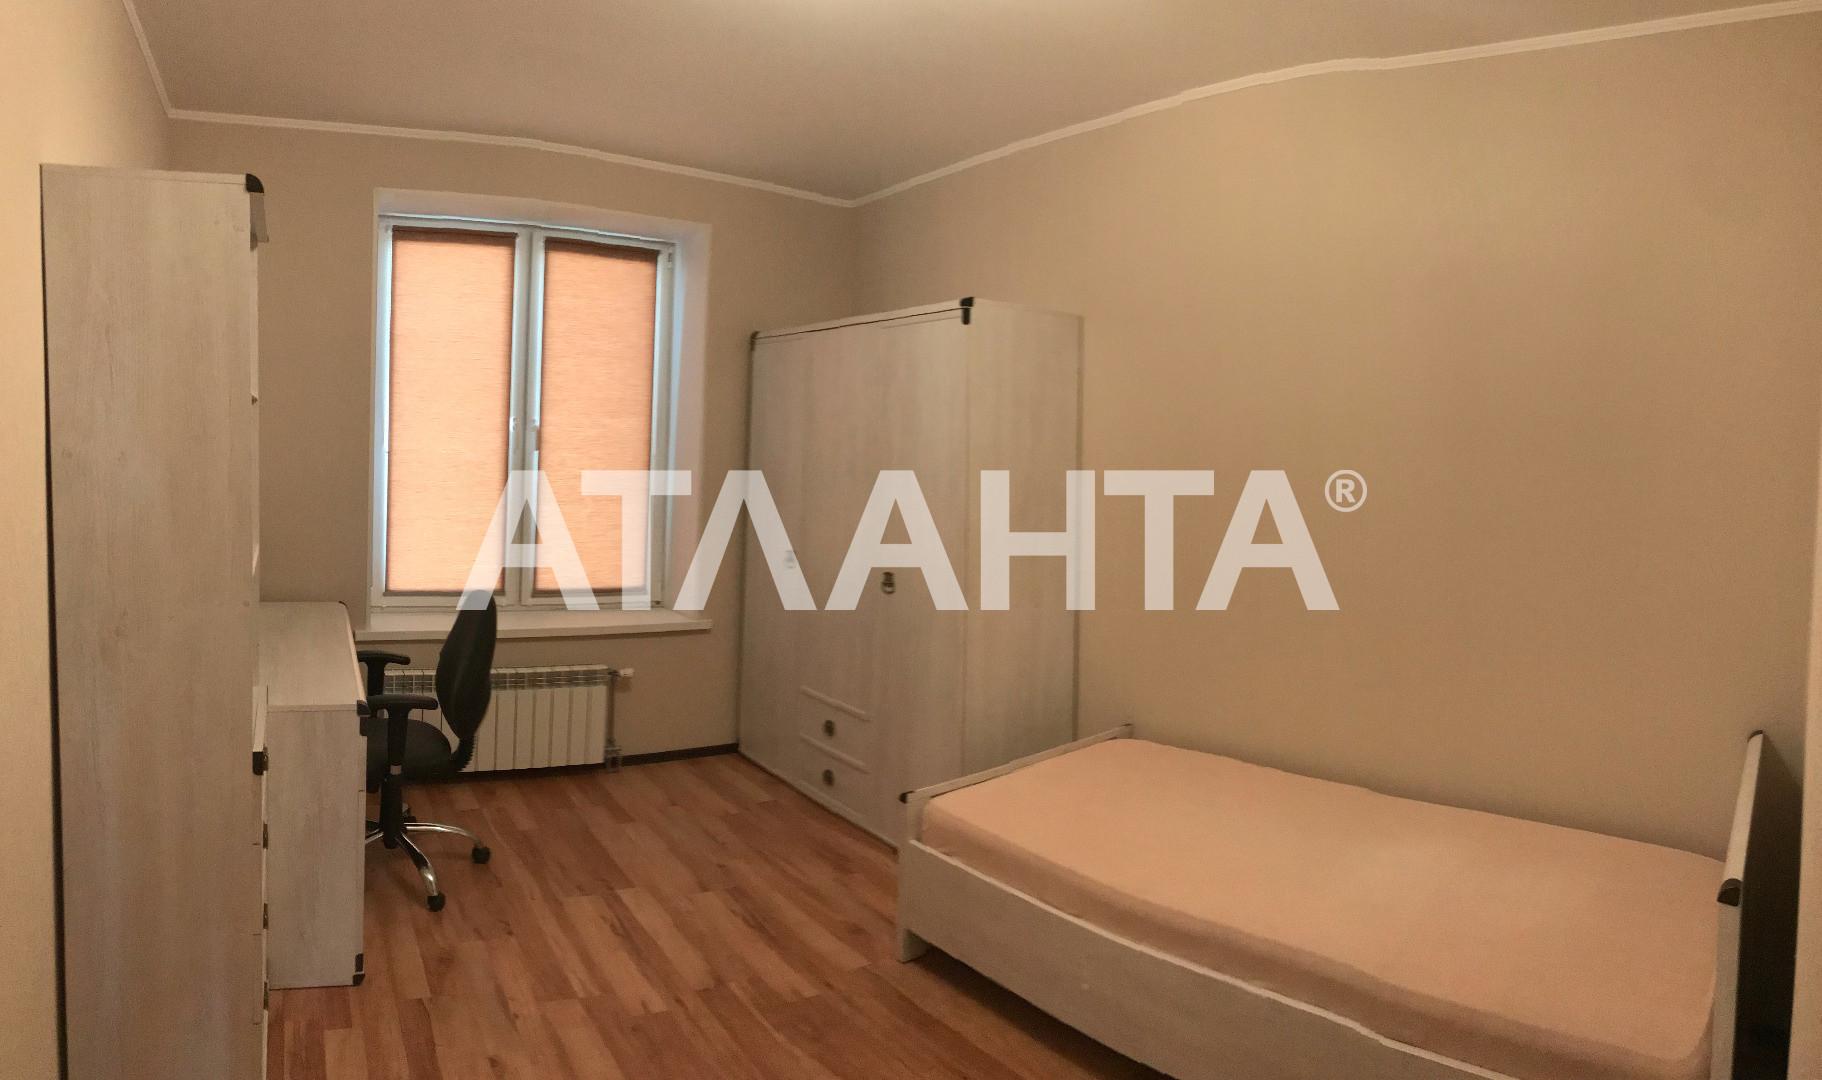 Продается 3-комнатная Квартира на ул. Ул. Ломоносова — 135 000 у.е. (фото №11)